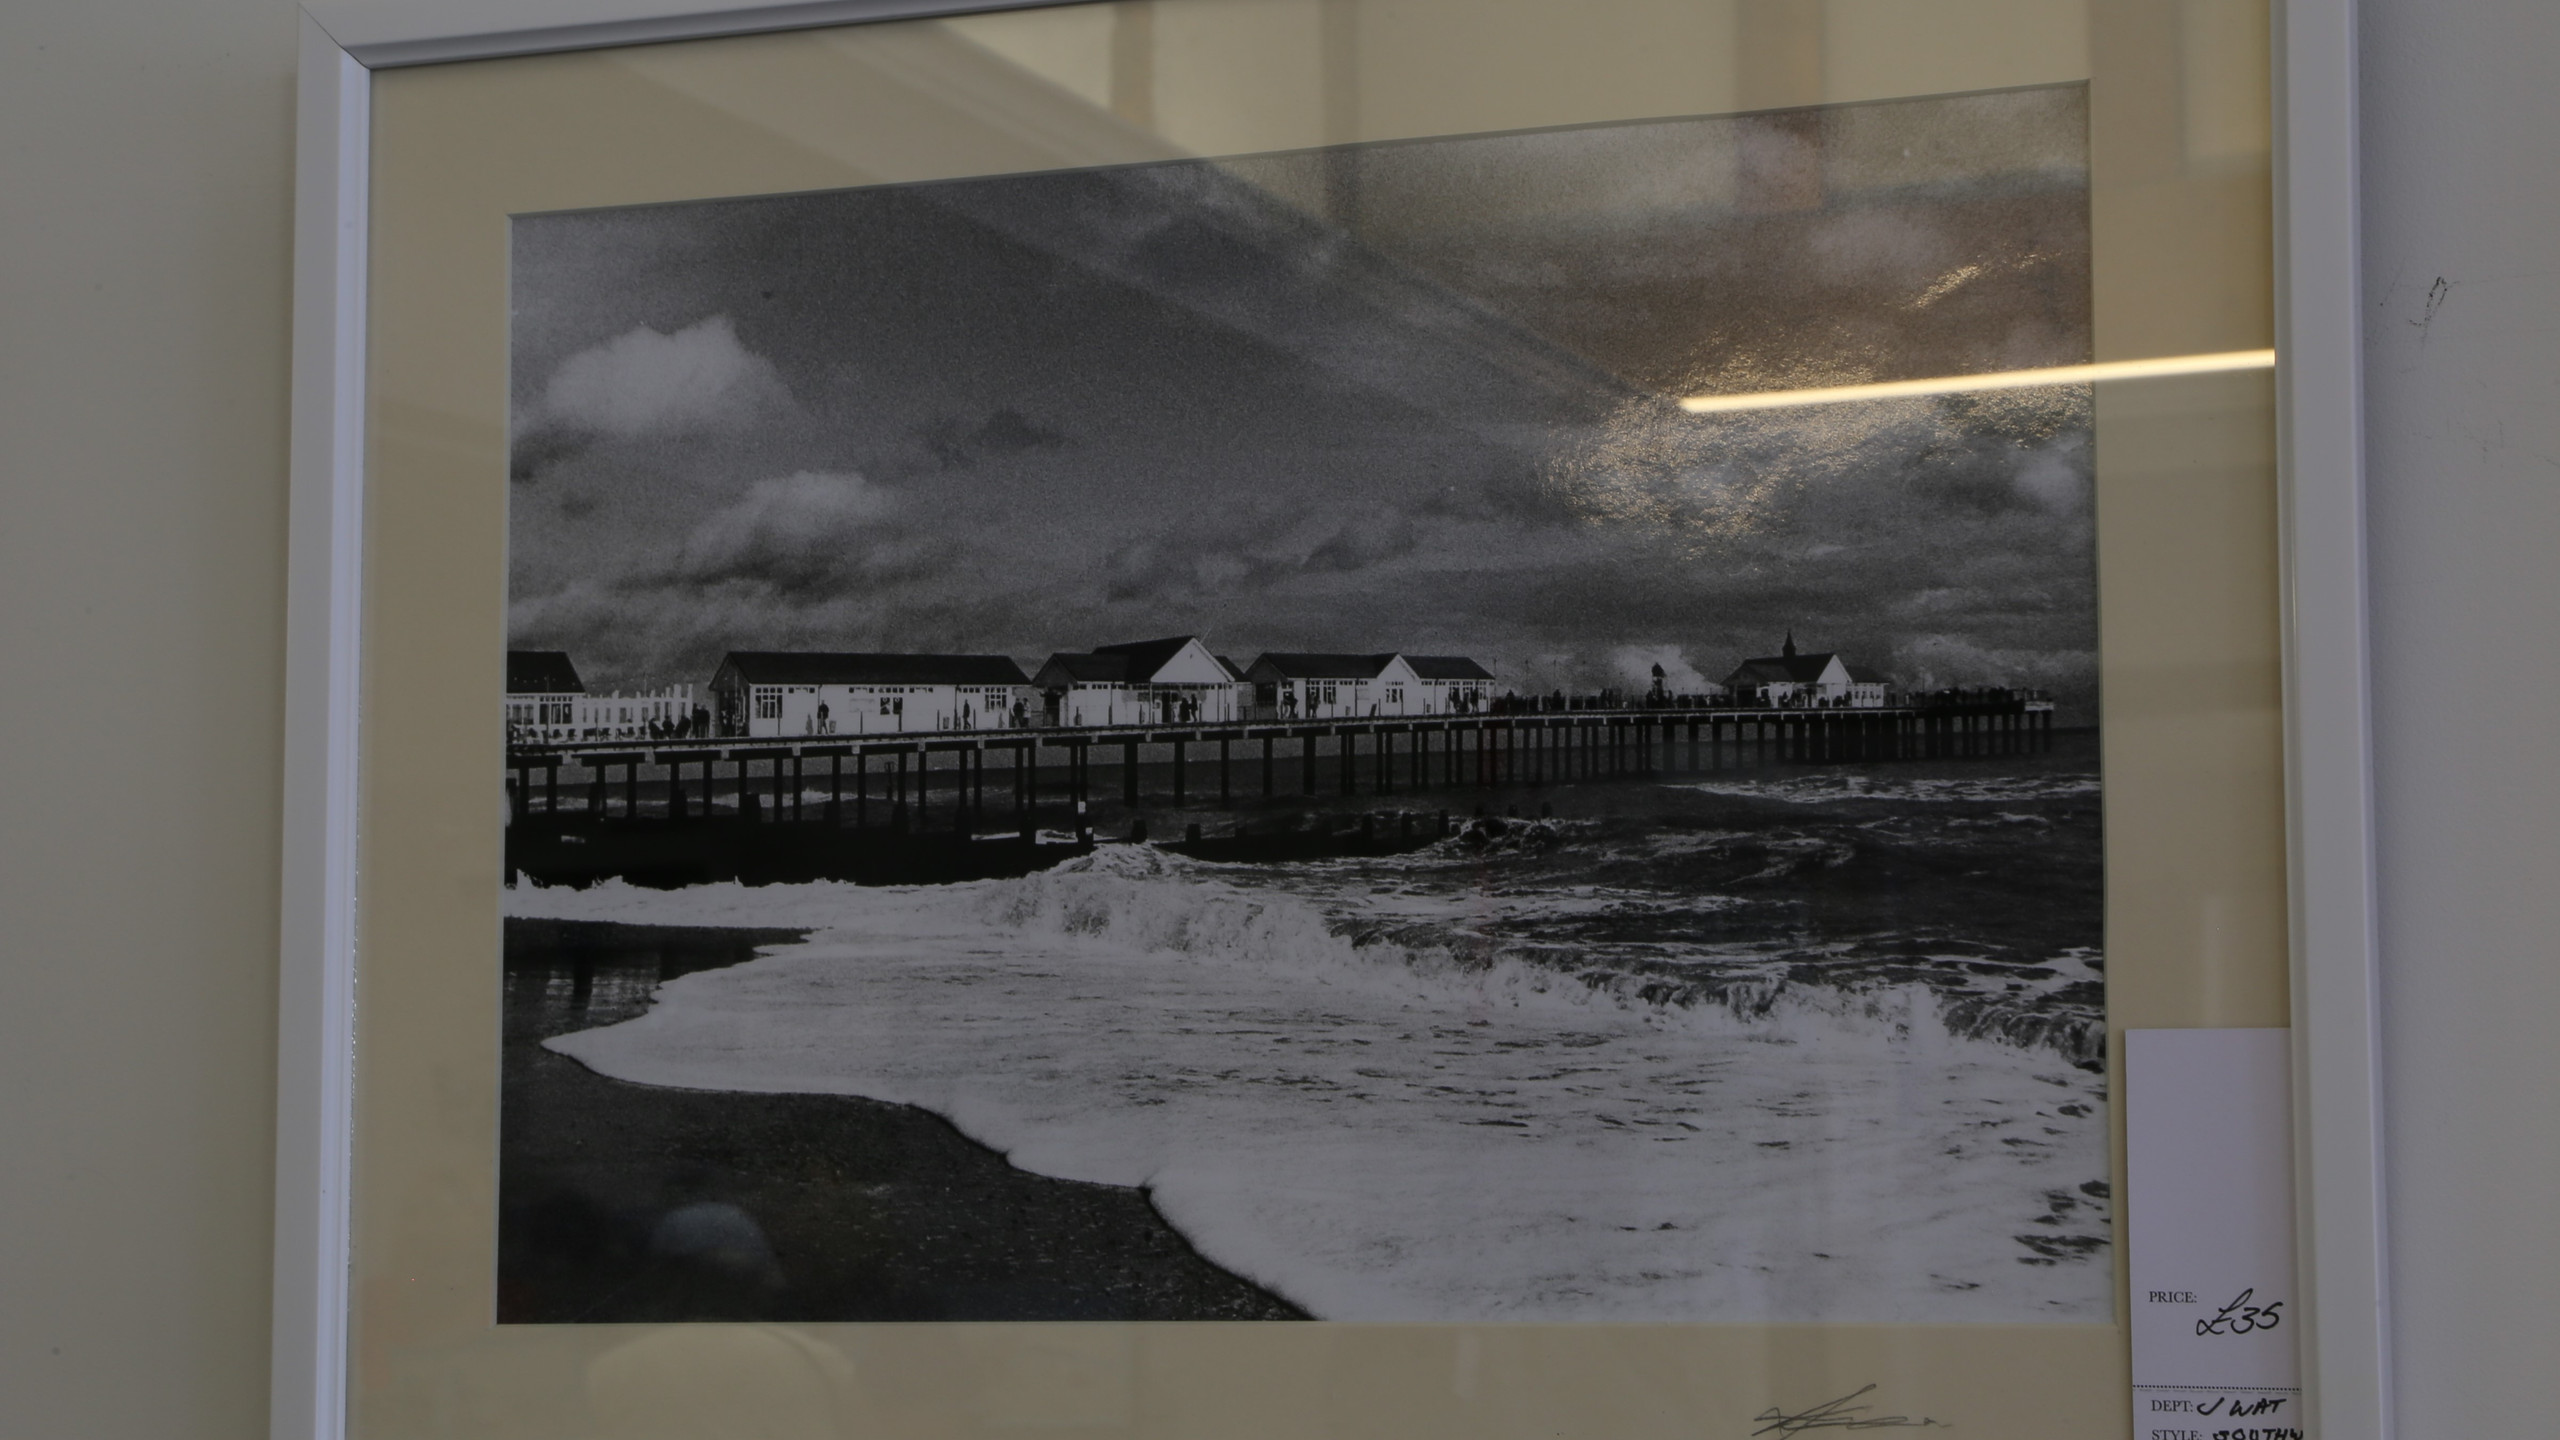 Black and white beach scene